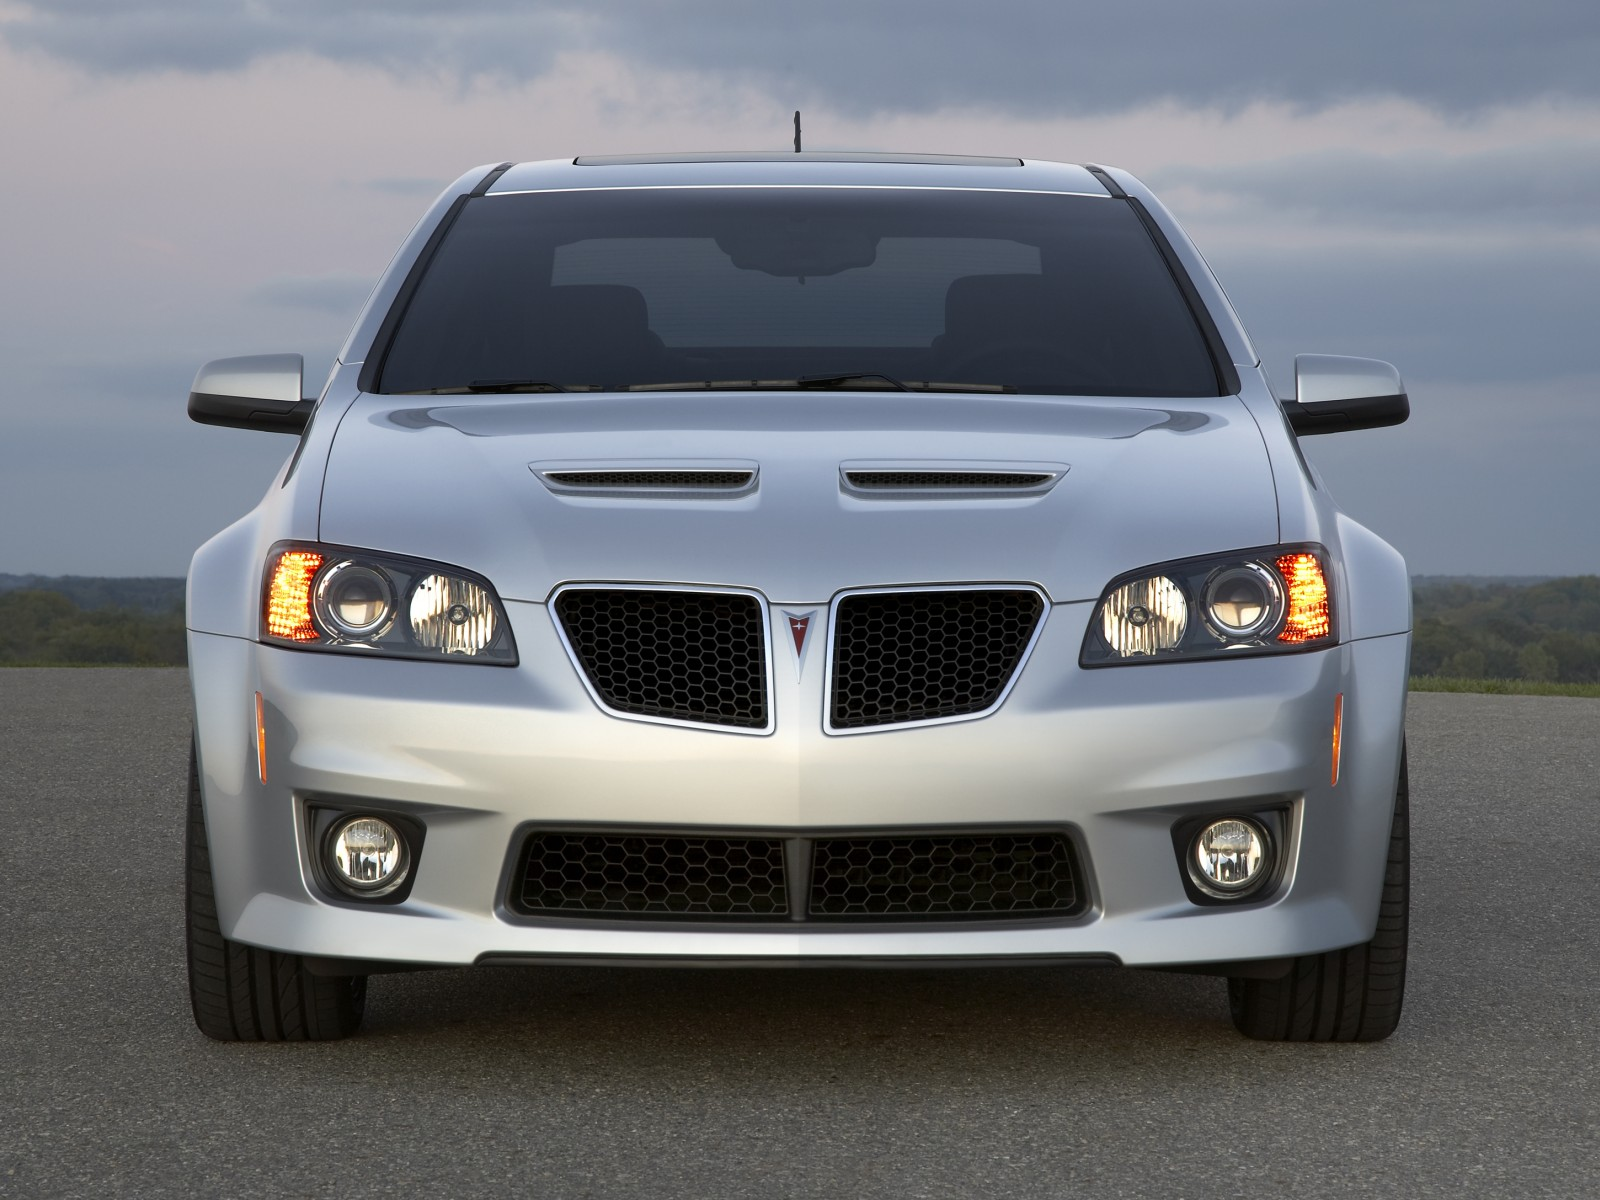 2009 Pontiac G8 Gxp Motor Desktop